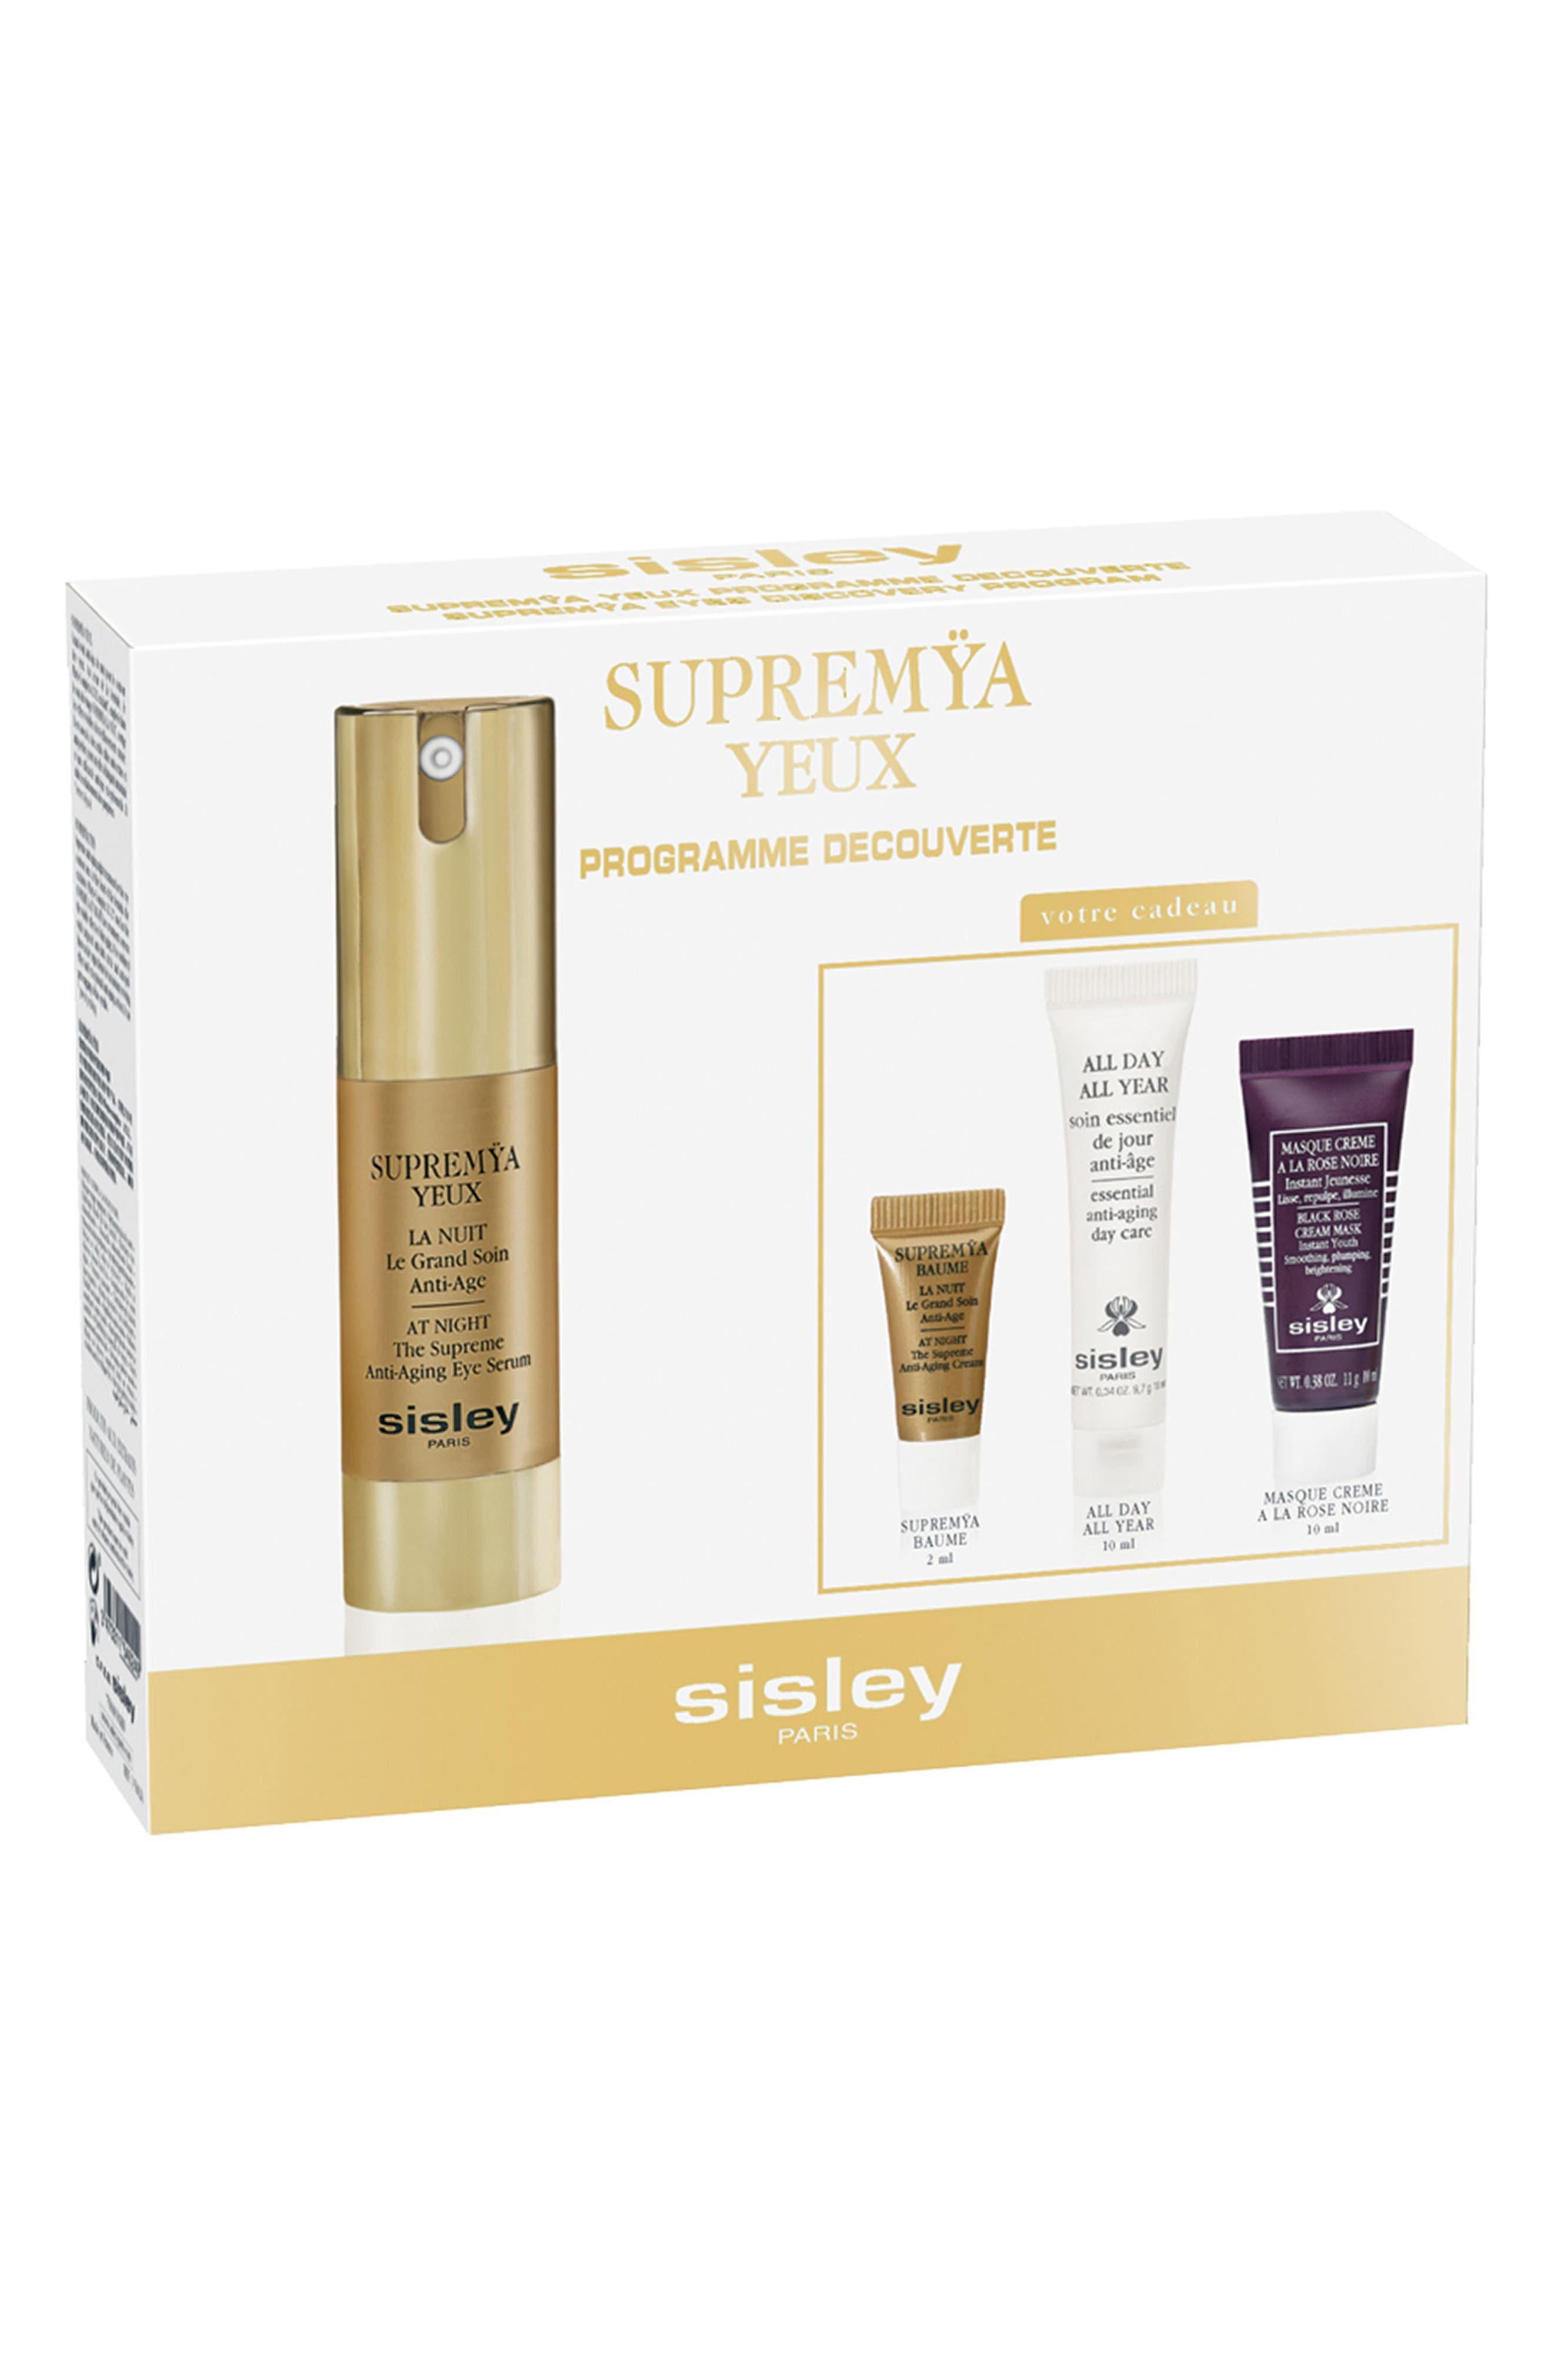 Sisley Paris Supremya Eyes Set ($455.80 Value)